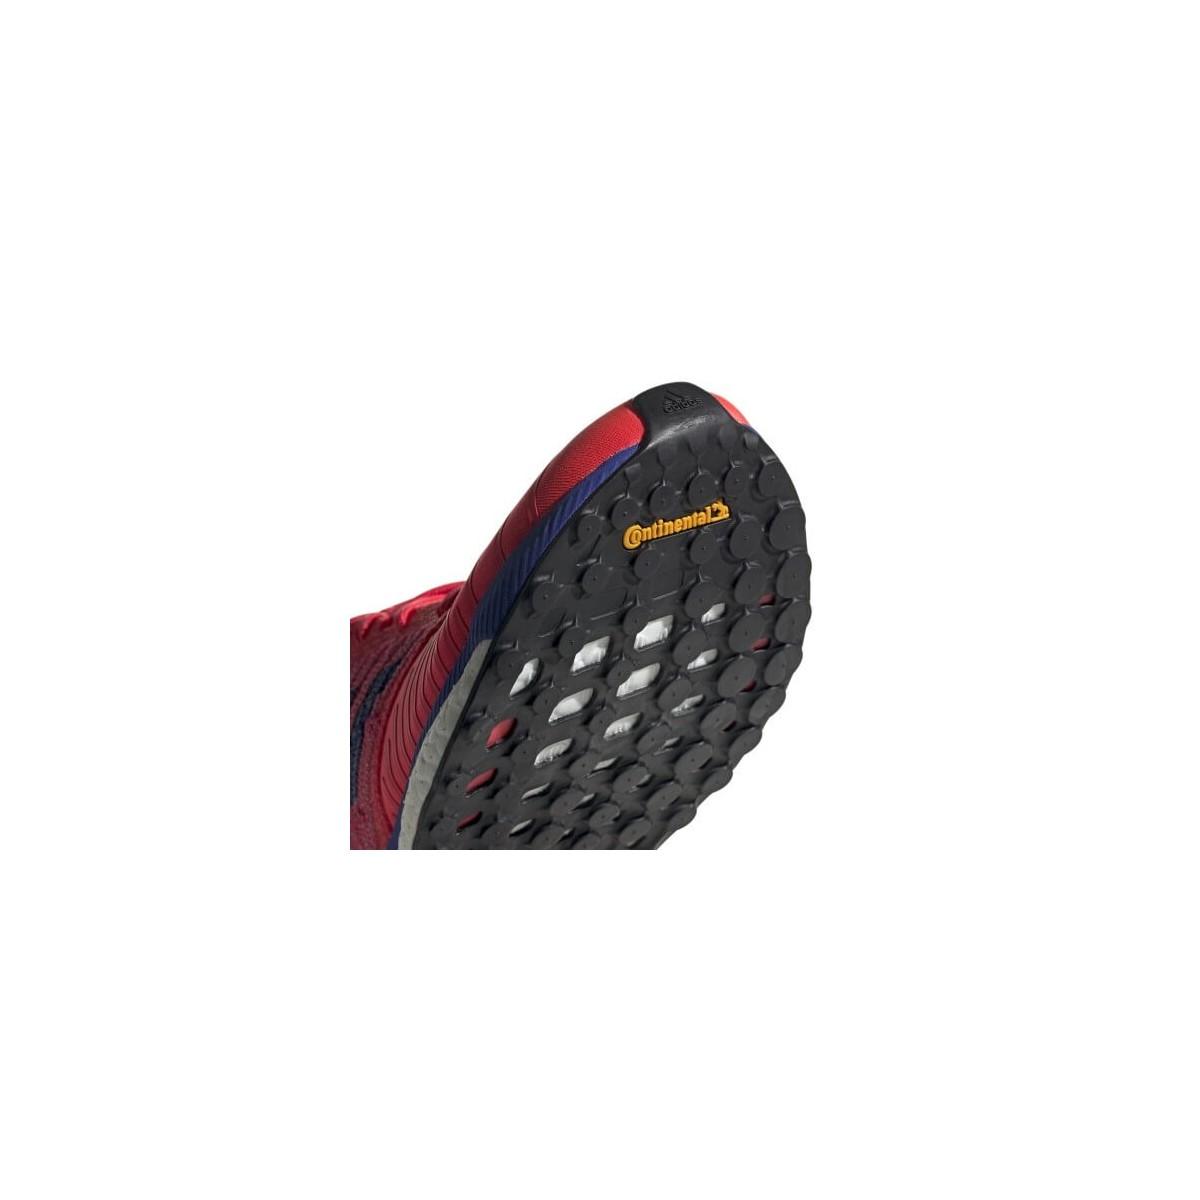 Zapatillas Adidas Solar Boost Rosa Purpura PV19 Mujer 365